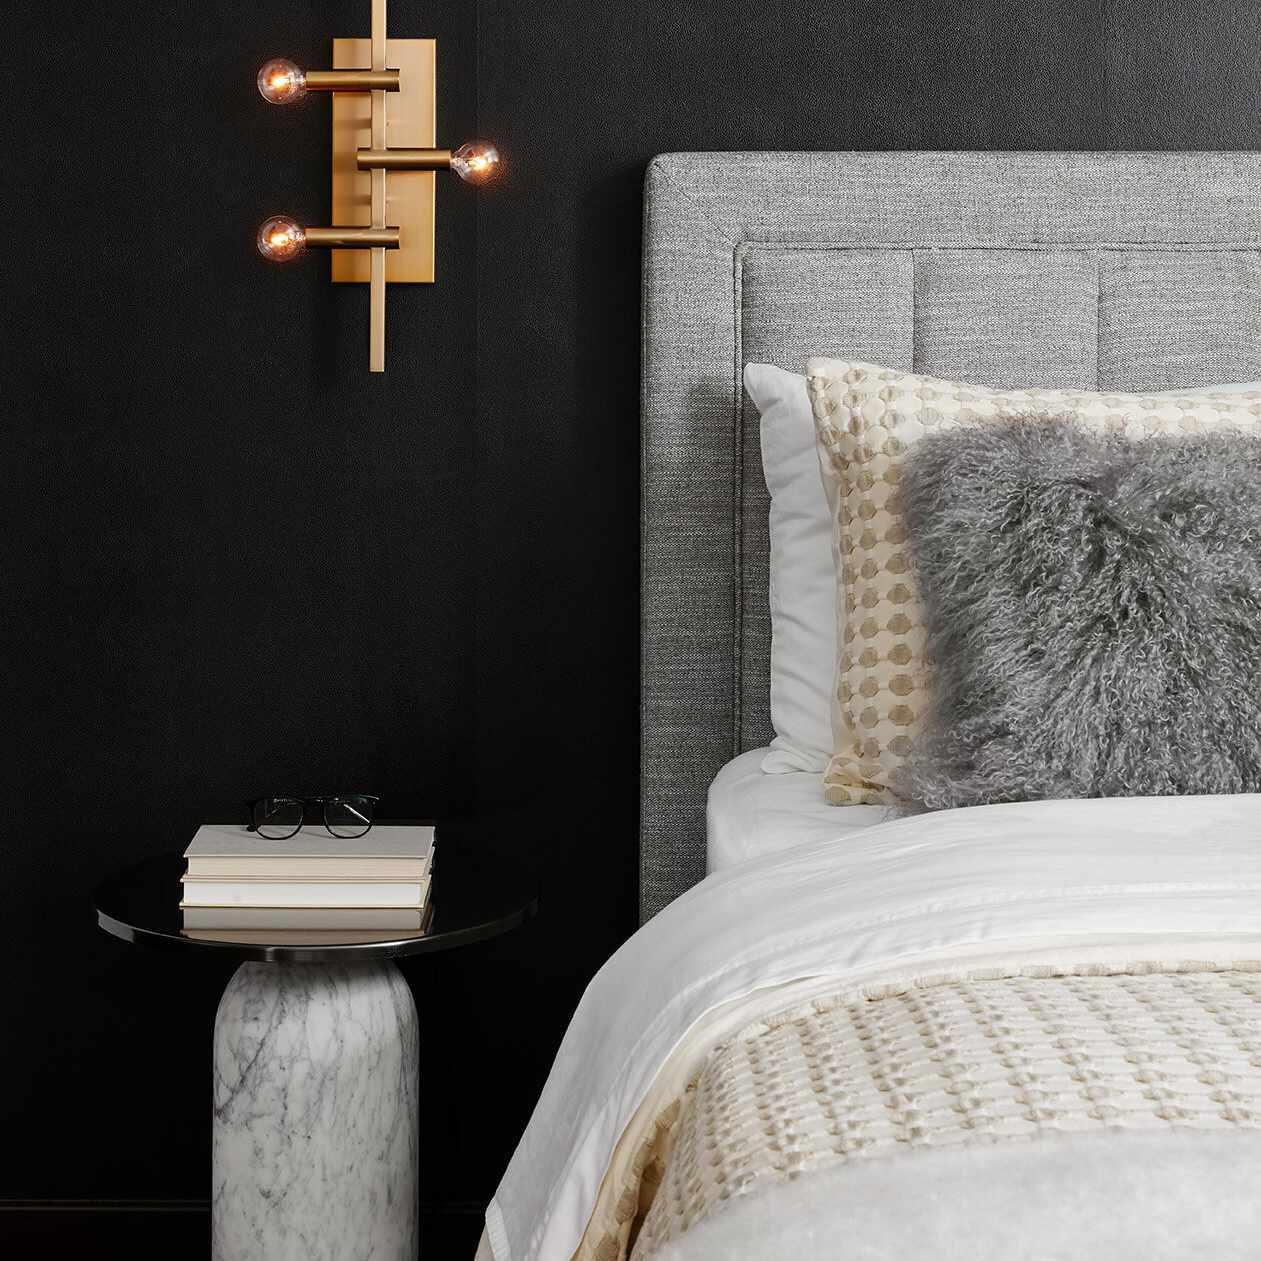 Dark gray and black bedroom with metallic accents